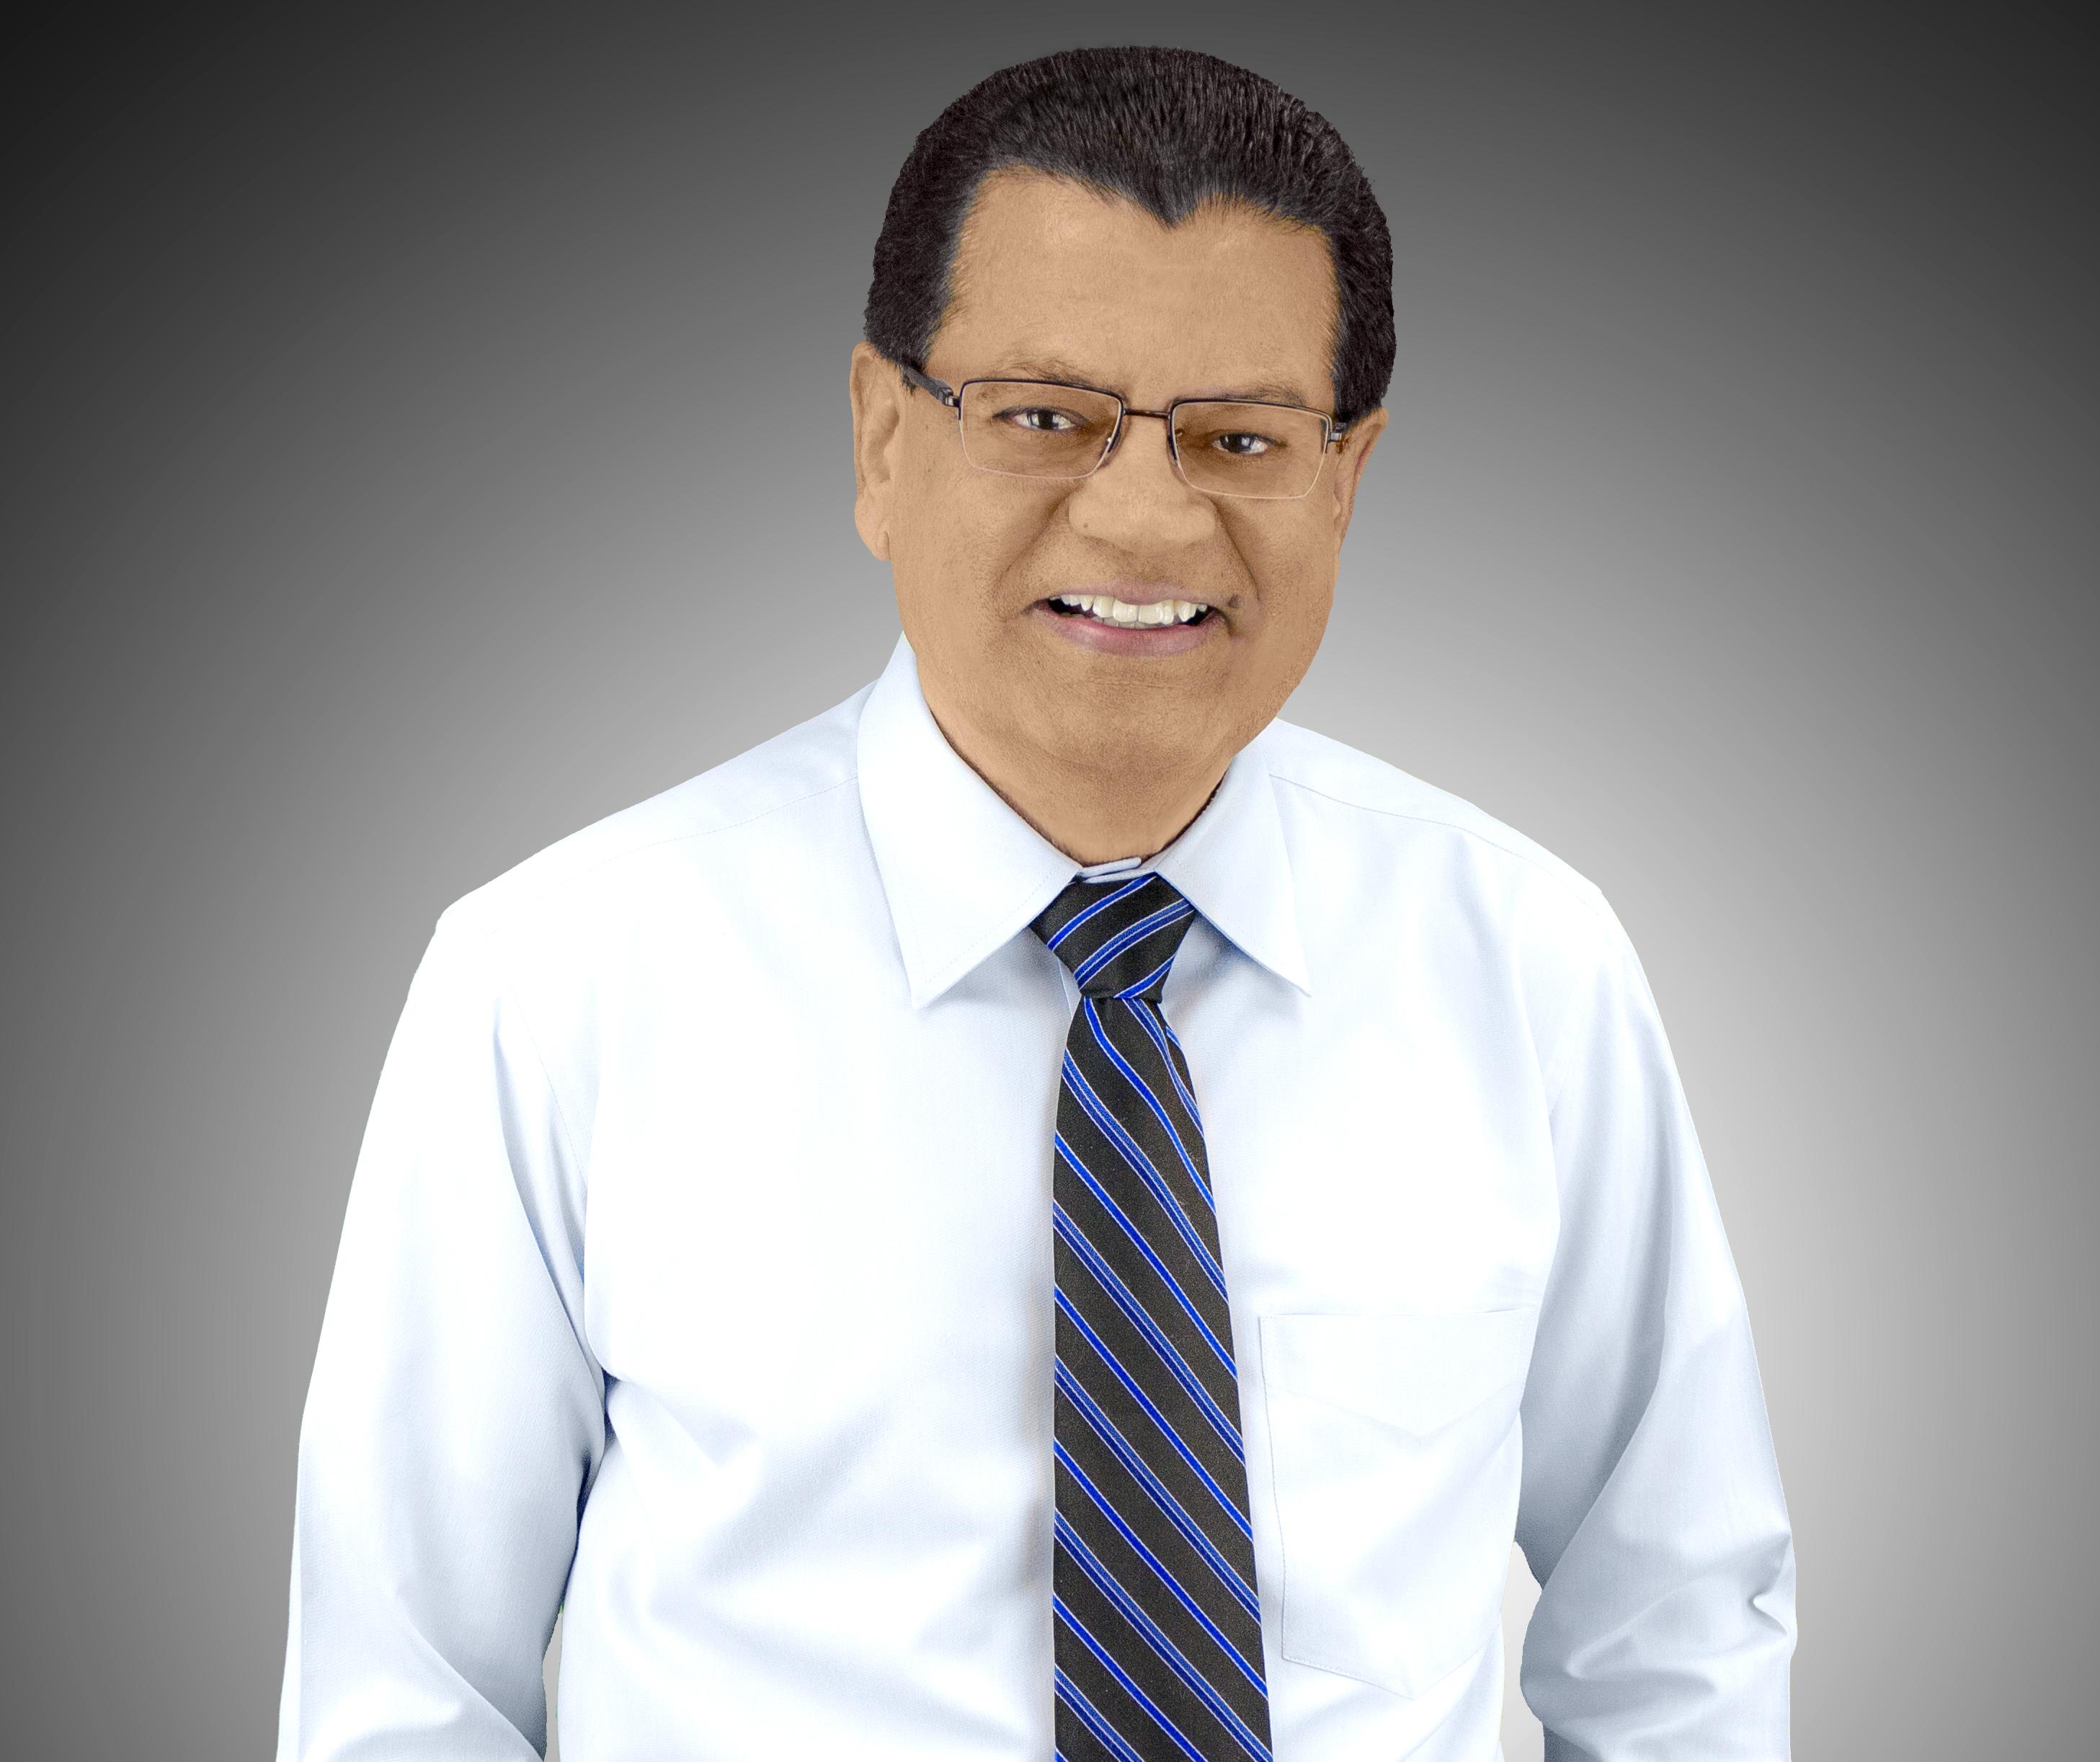 Mukesh undefined Patel